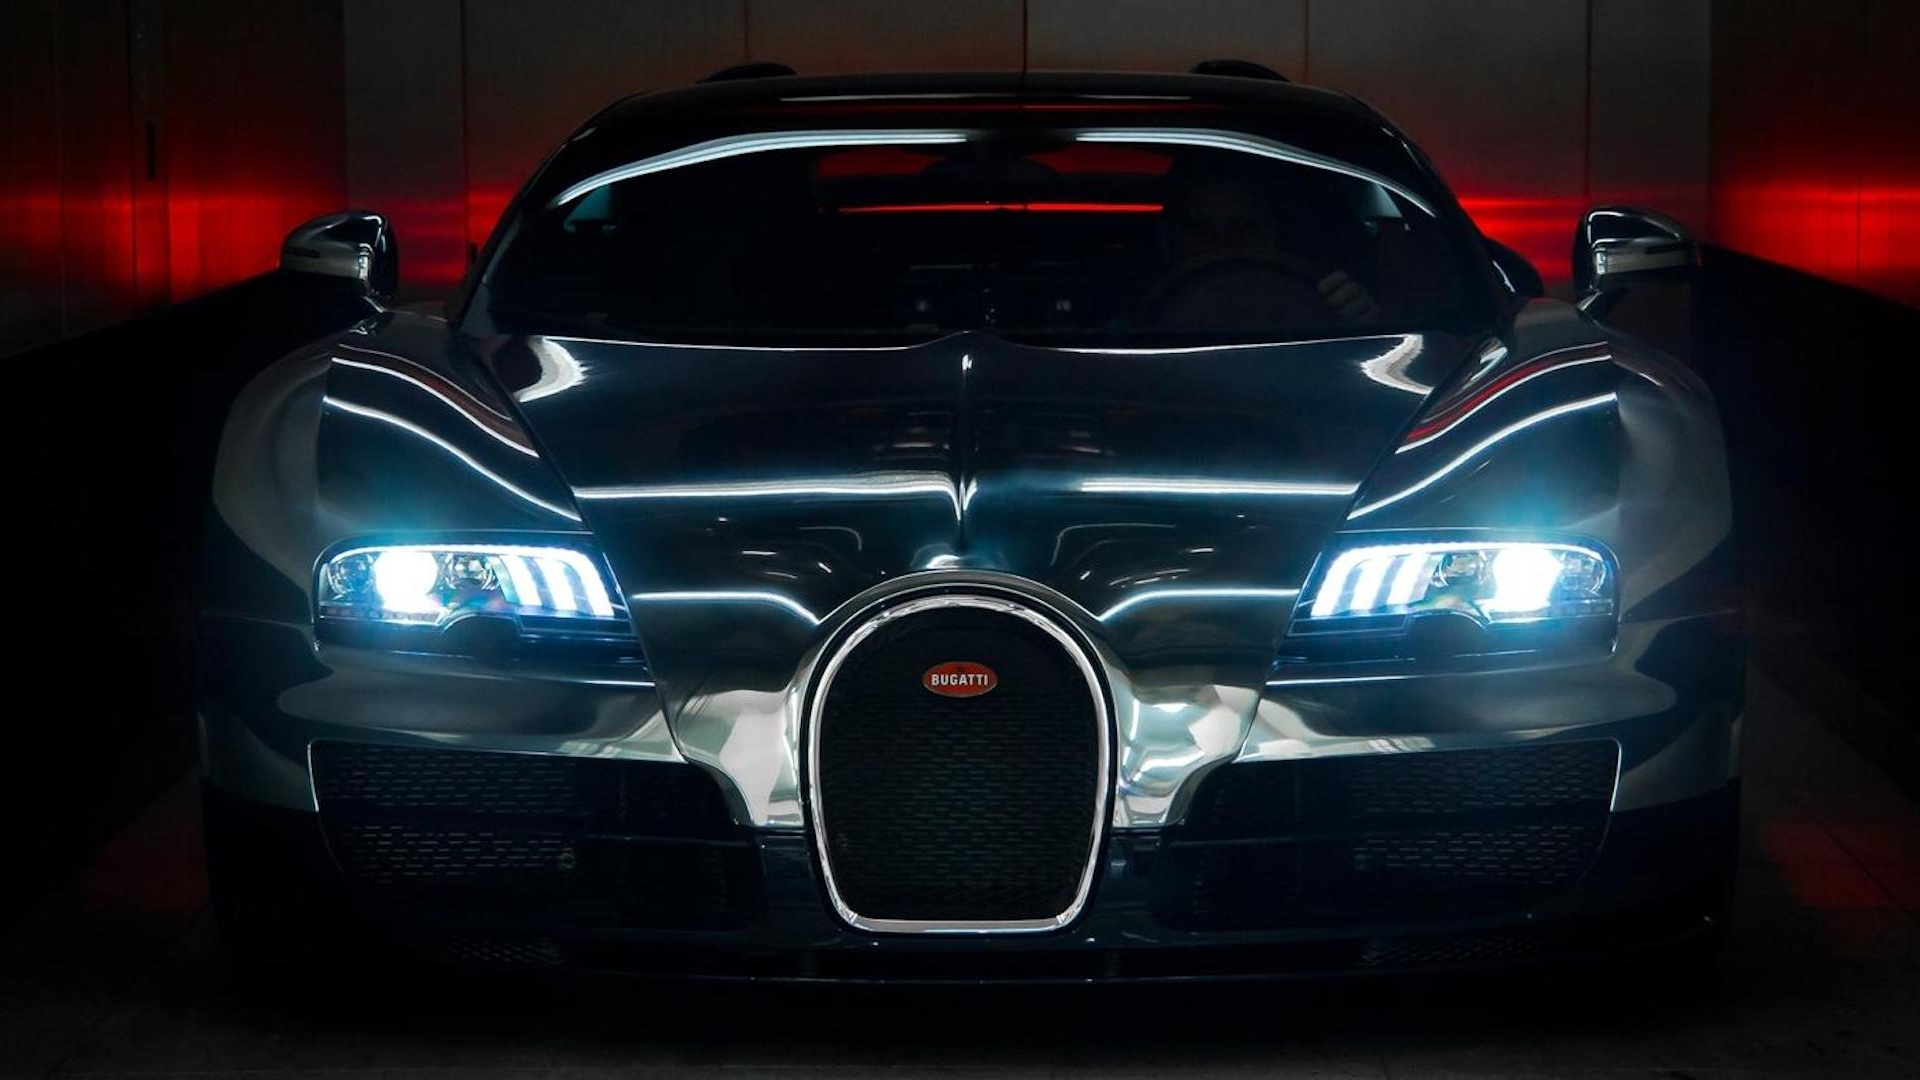 Bugatti ETTORE Slideshow